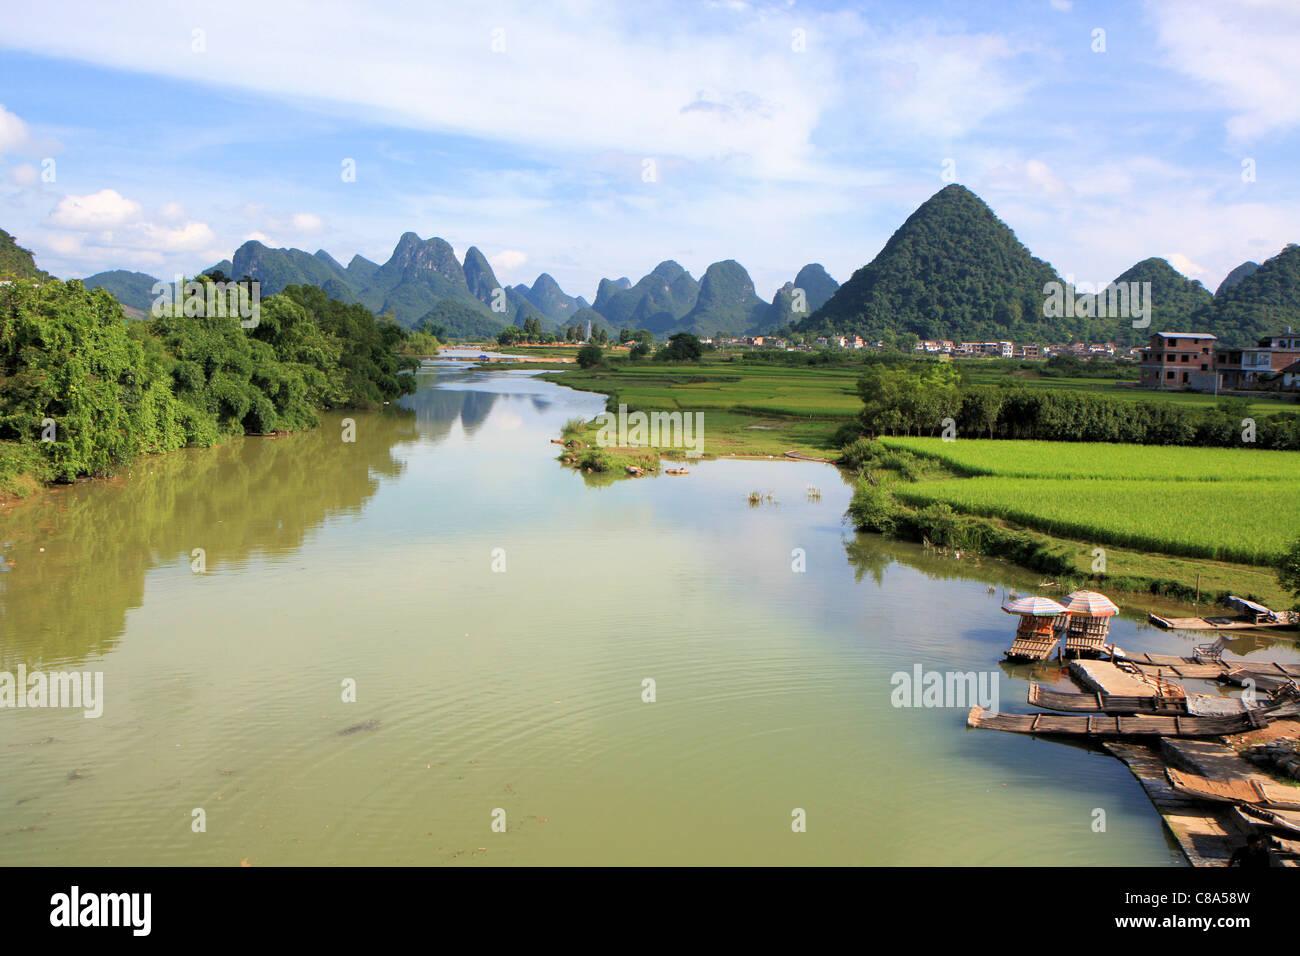 The Li river, Yangshuo, China Stock Photo